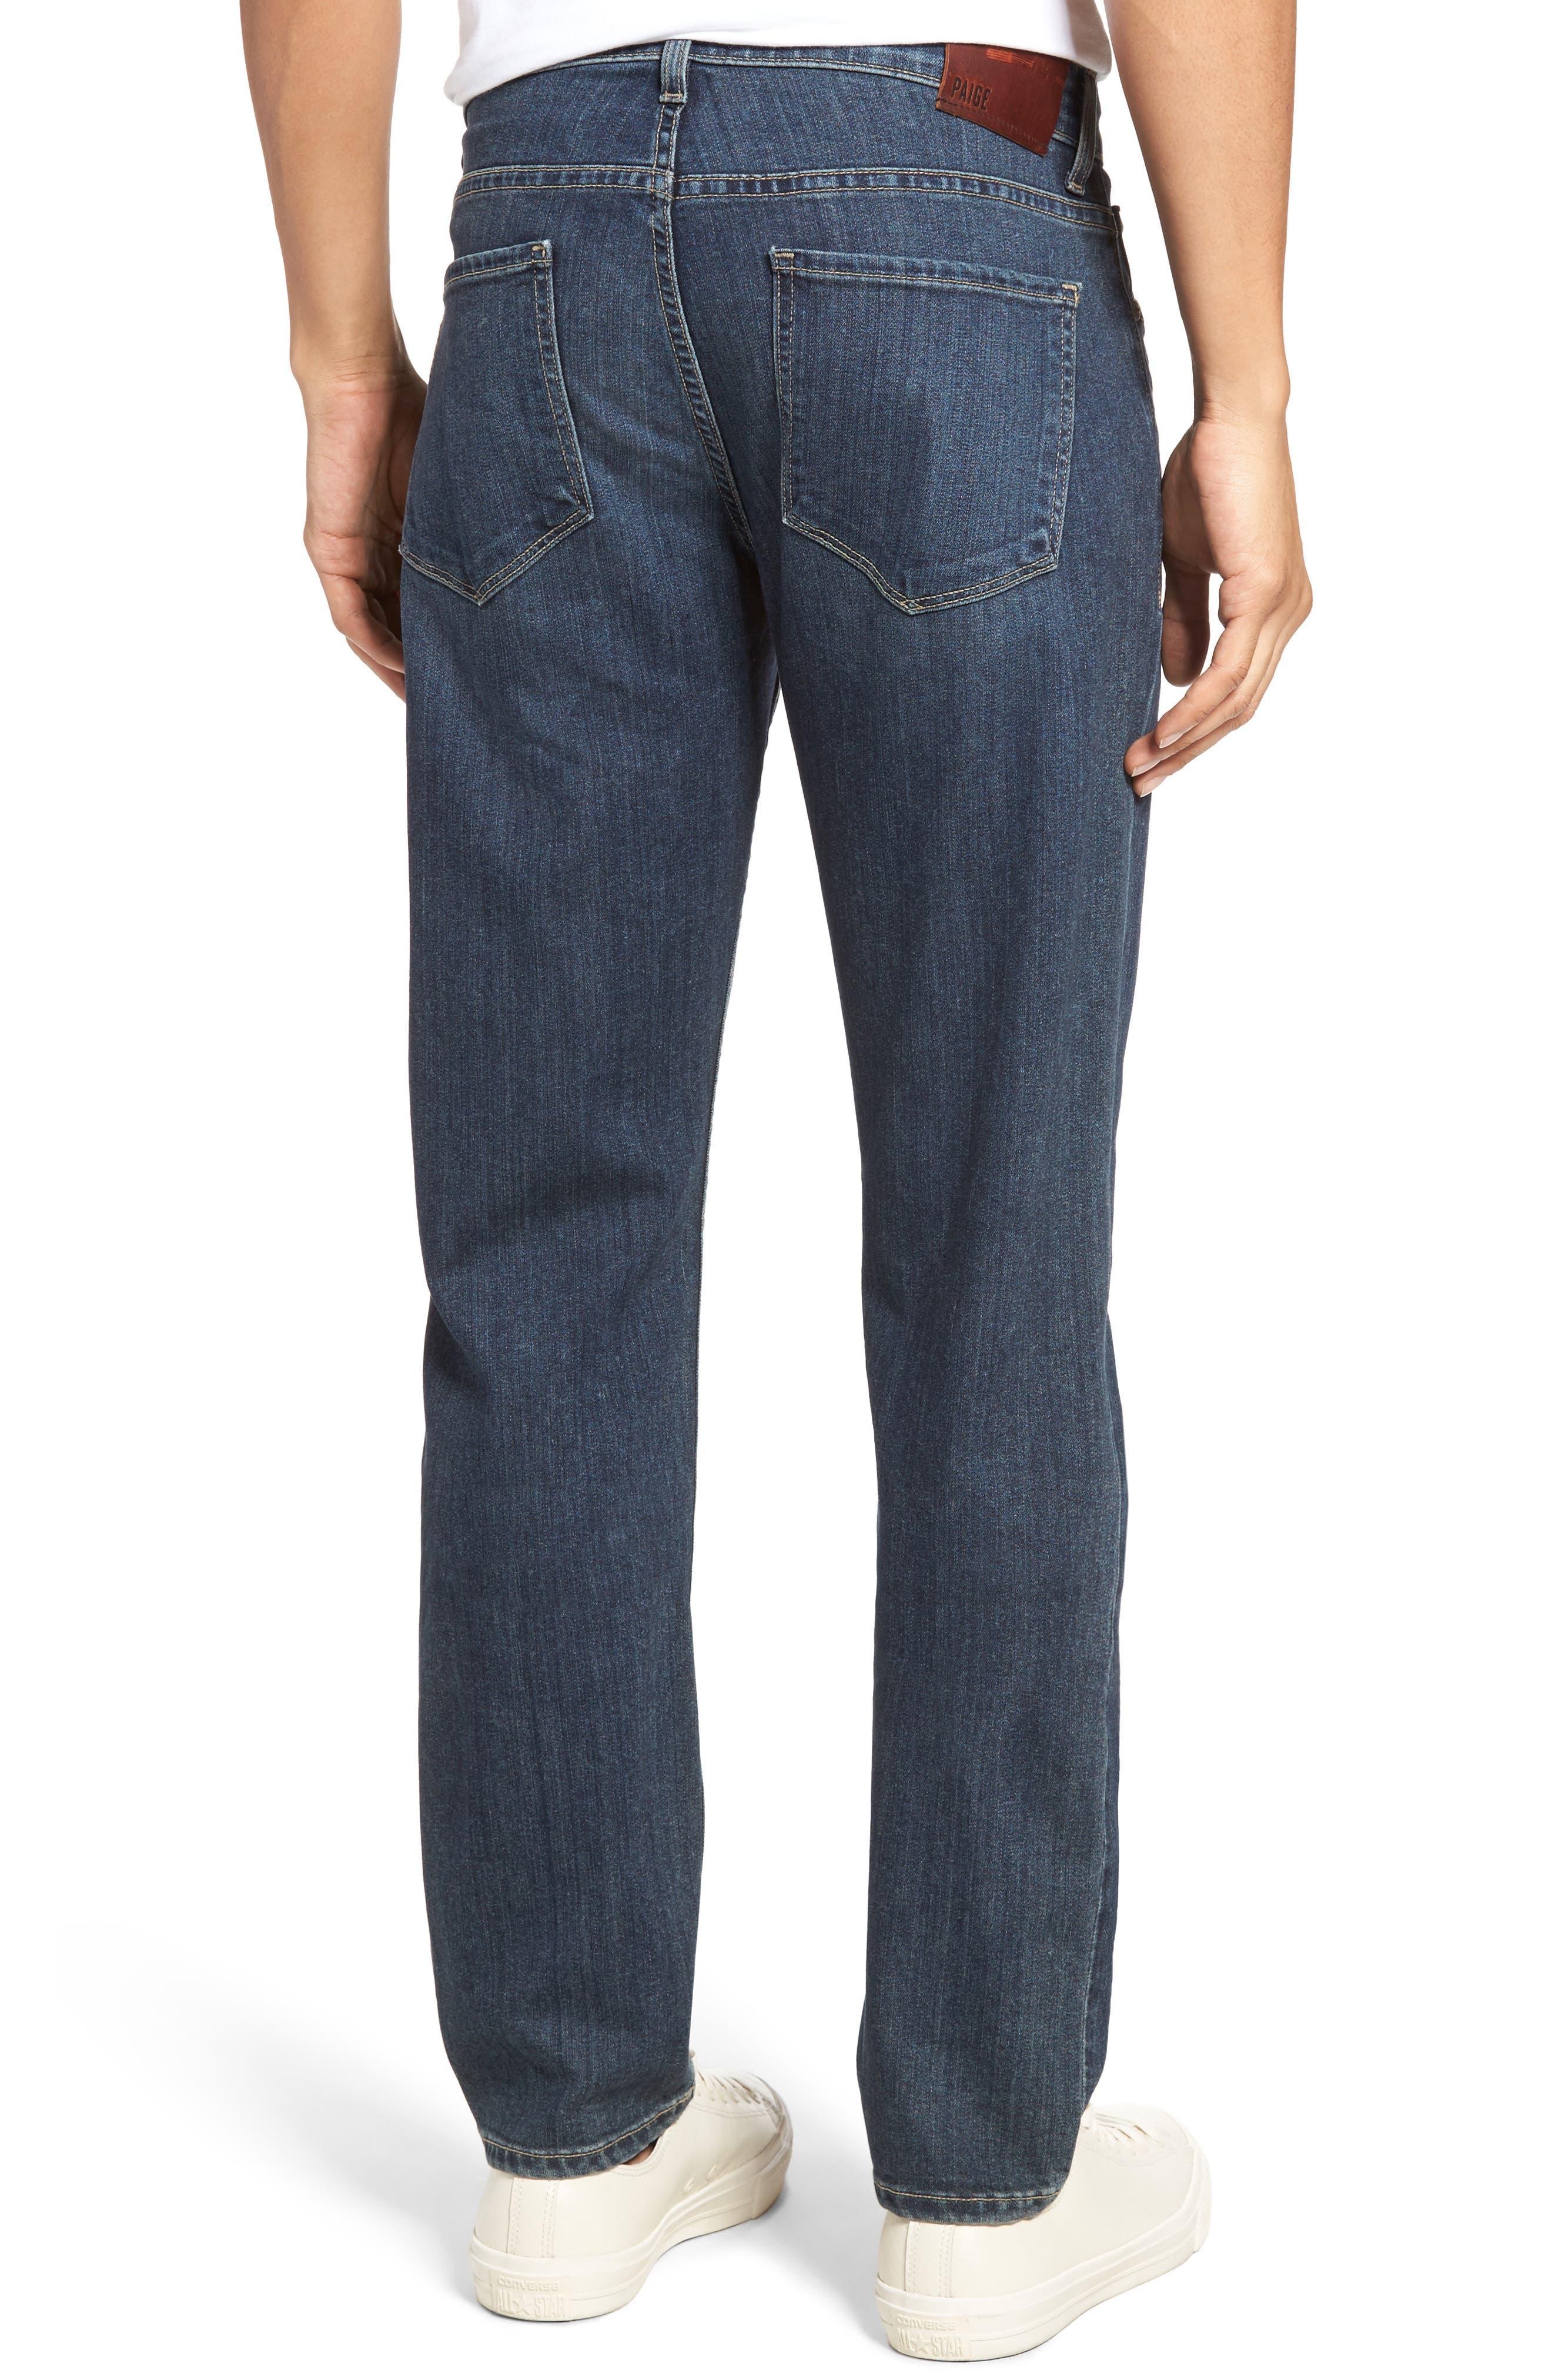 Transcend - Federal Slim Straight Leg Jeans,                             Alternate thumbnail 2, color,                             WAYNE